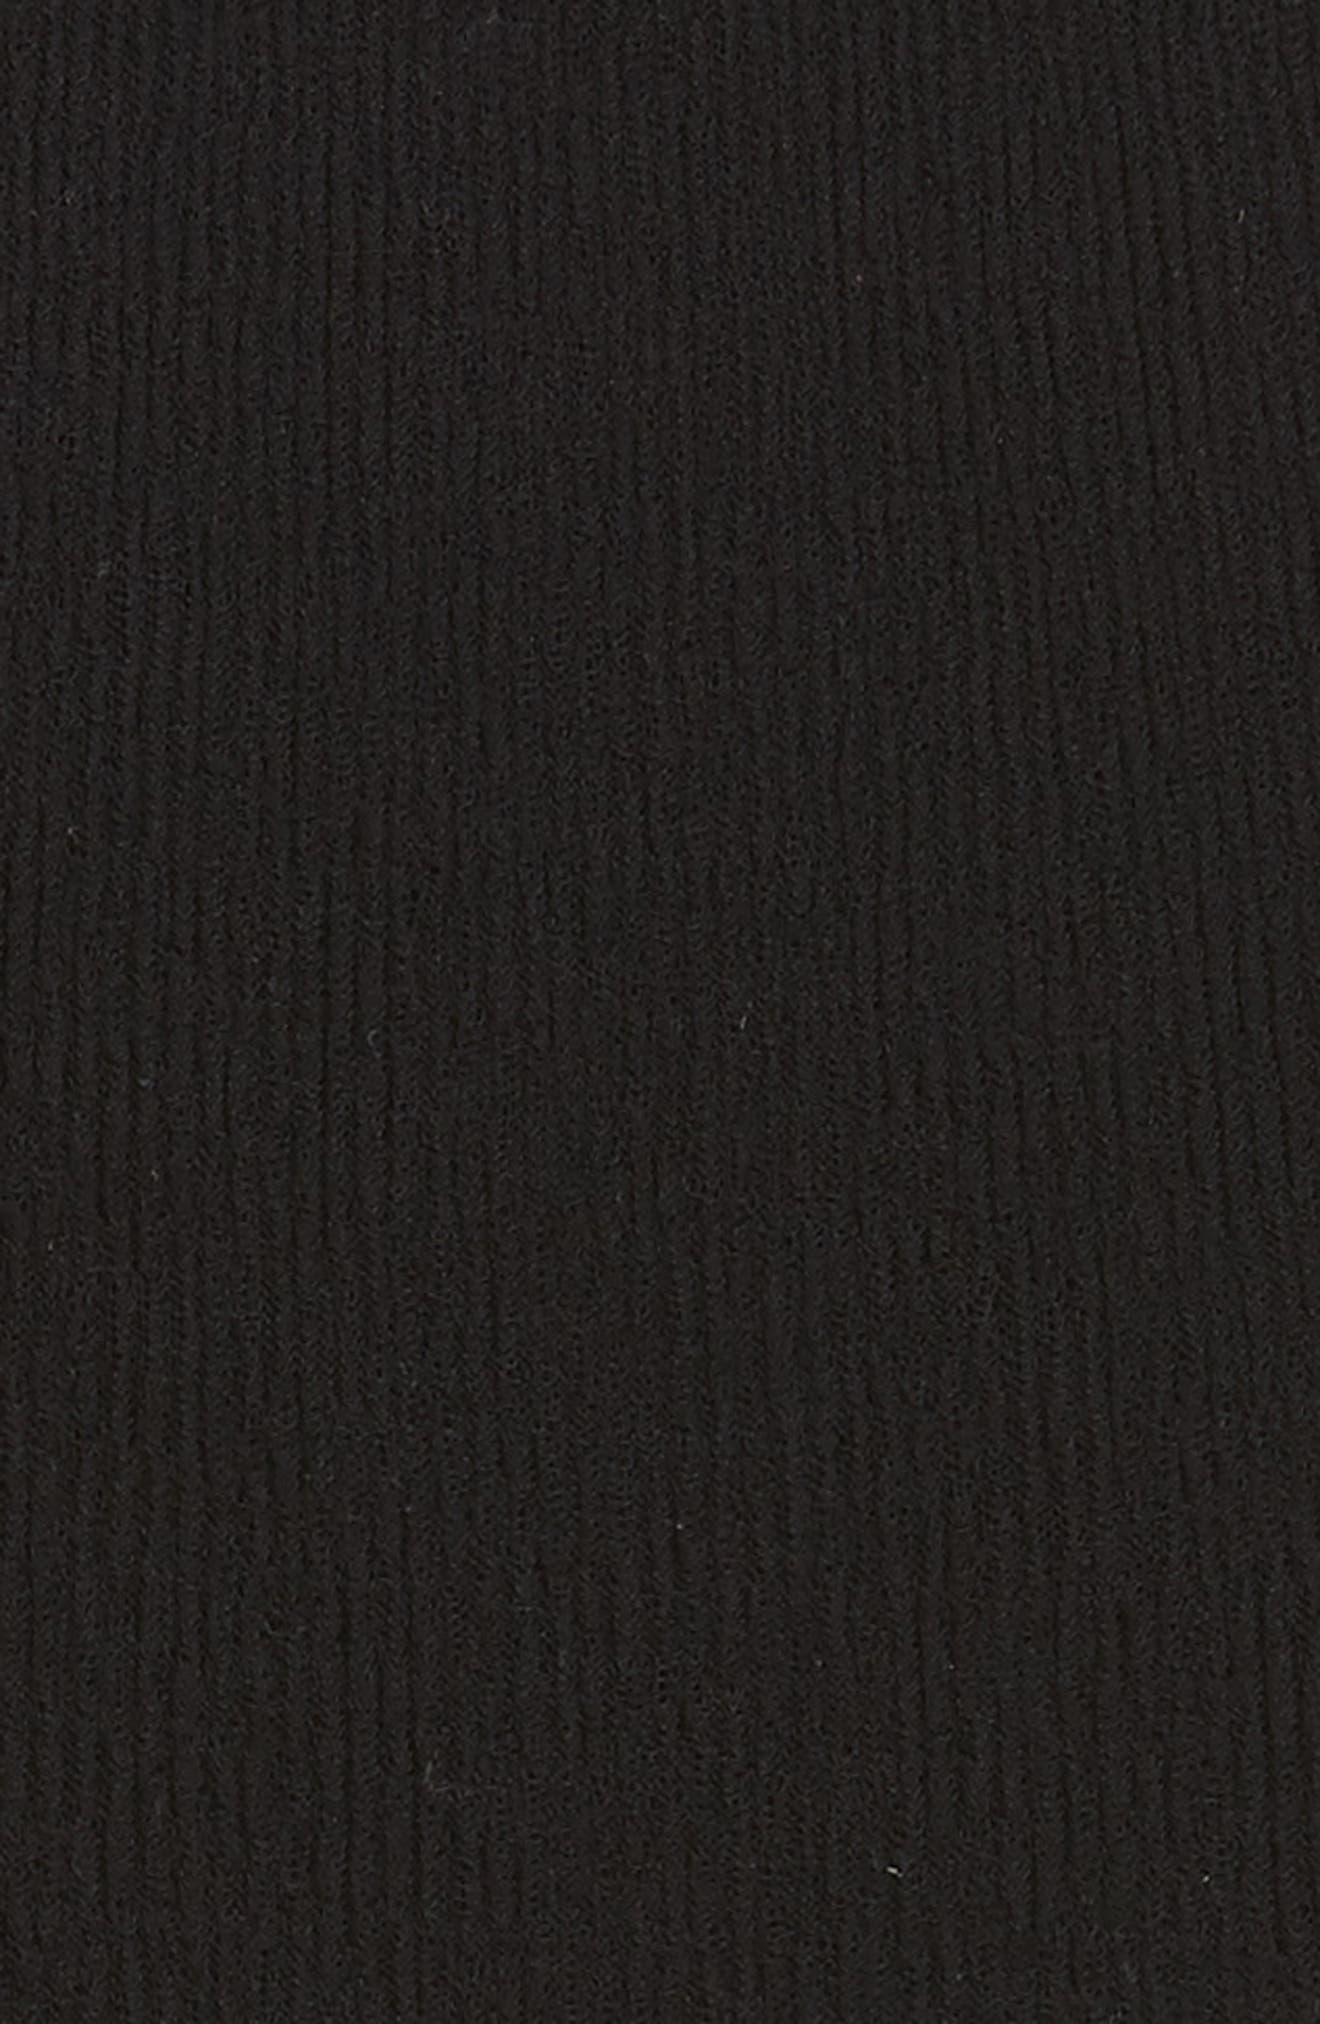 PSWL Jersey Gauze Dress,                             Alternate thumbnail 5, color,                             001